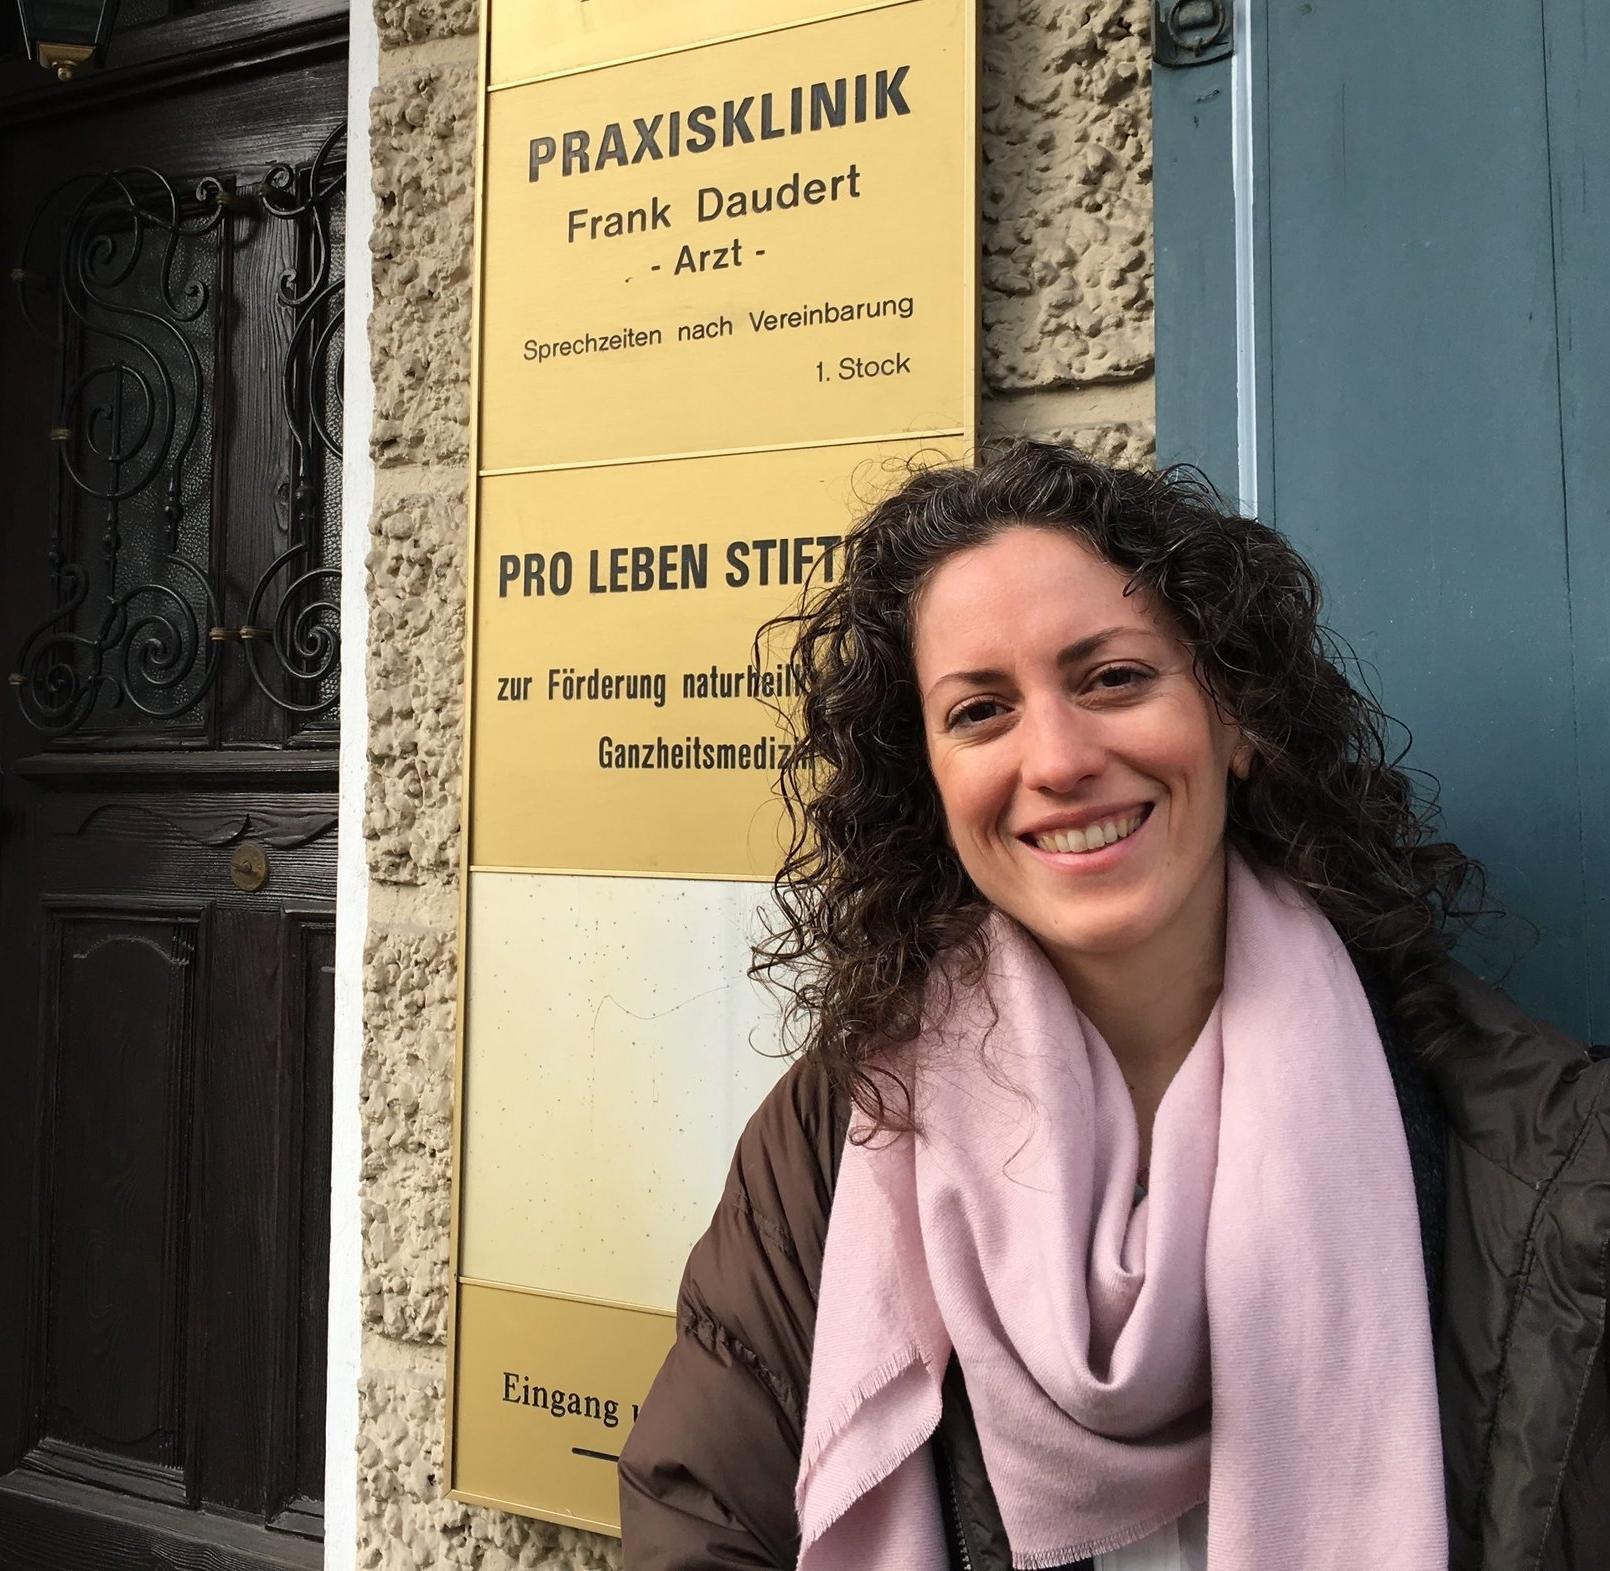 Visiting German Cancer Clinics Praxisklinik Frank Daudert